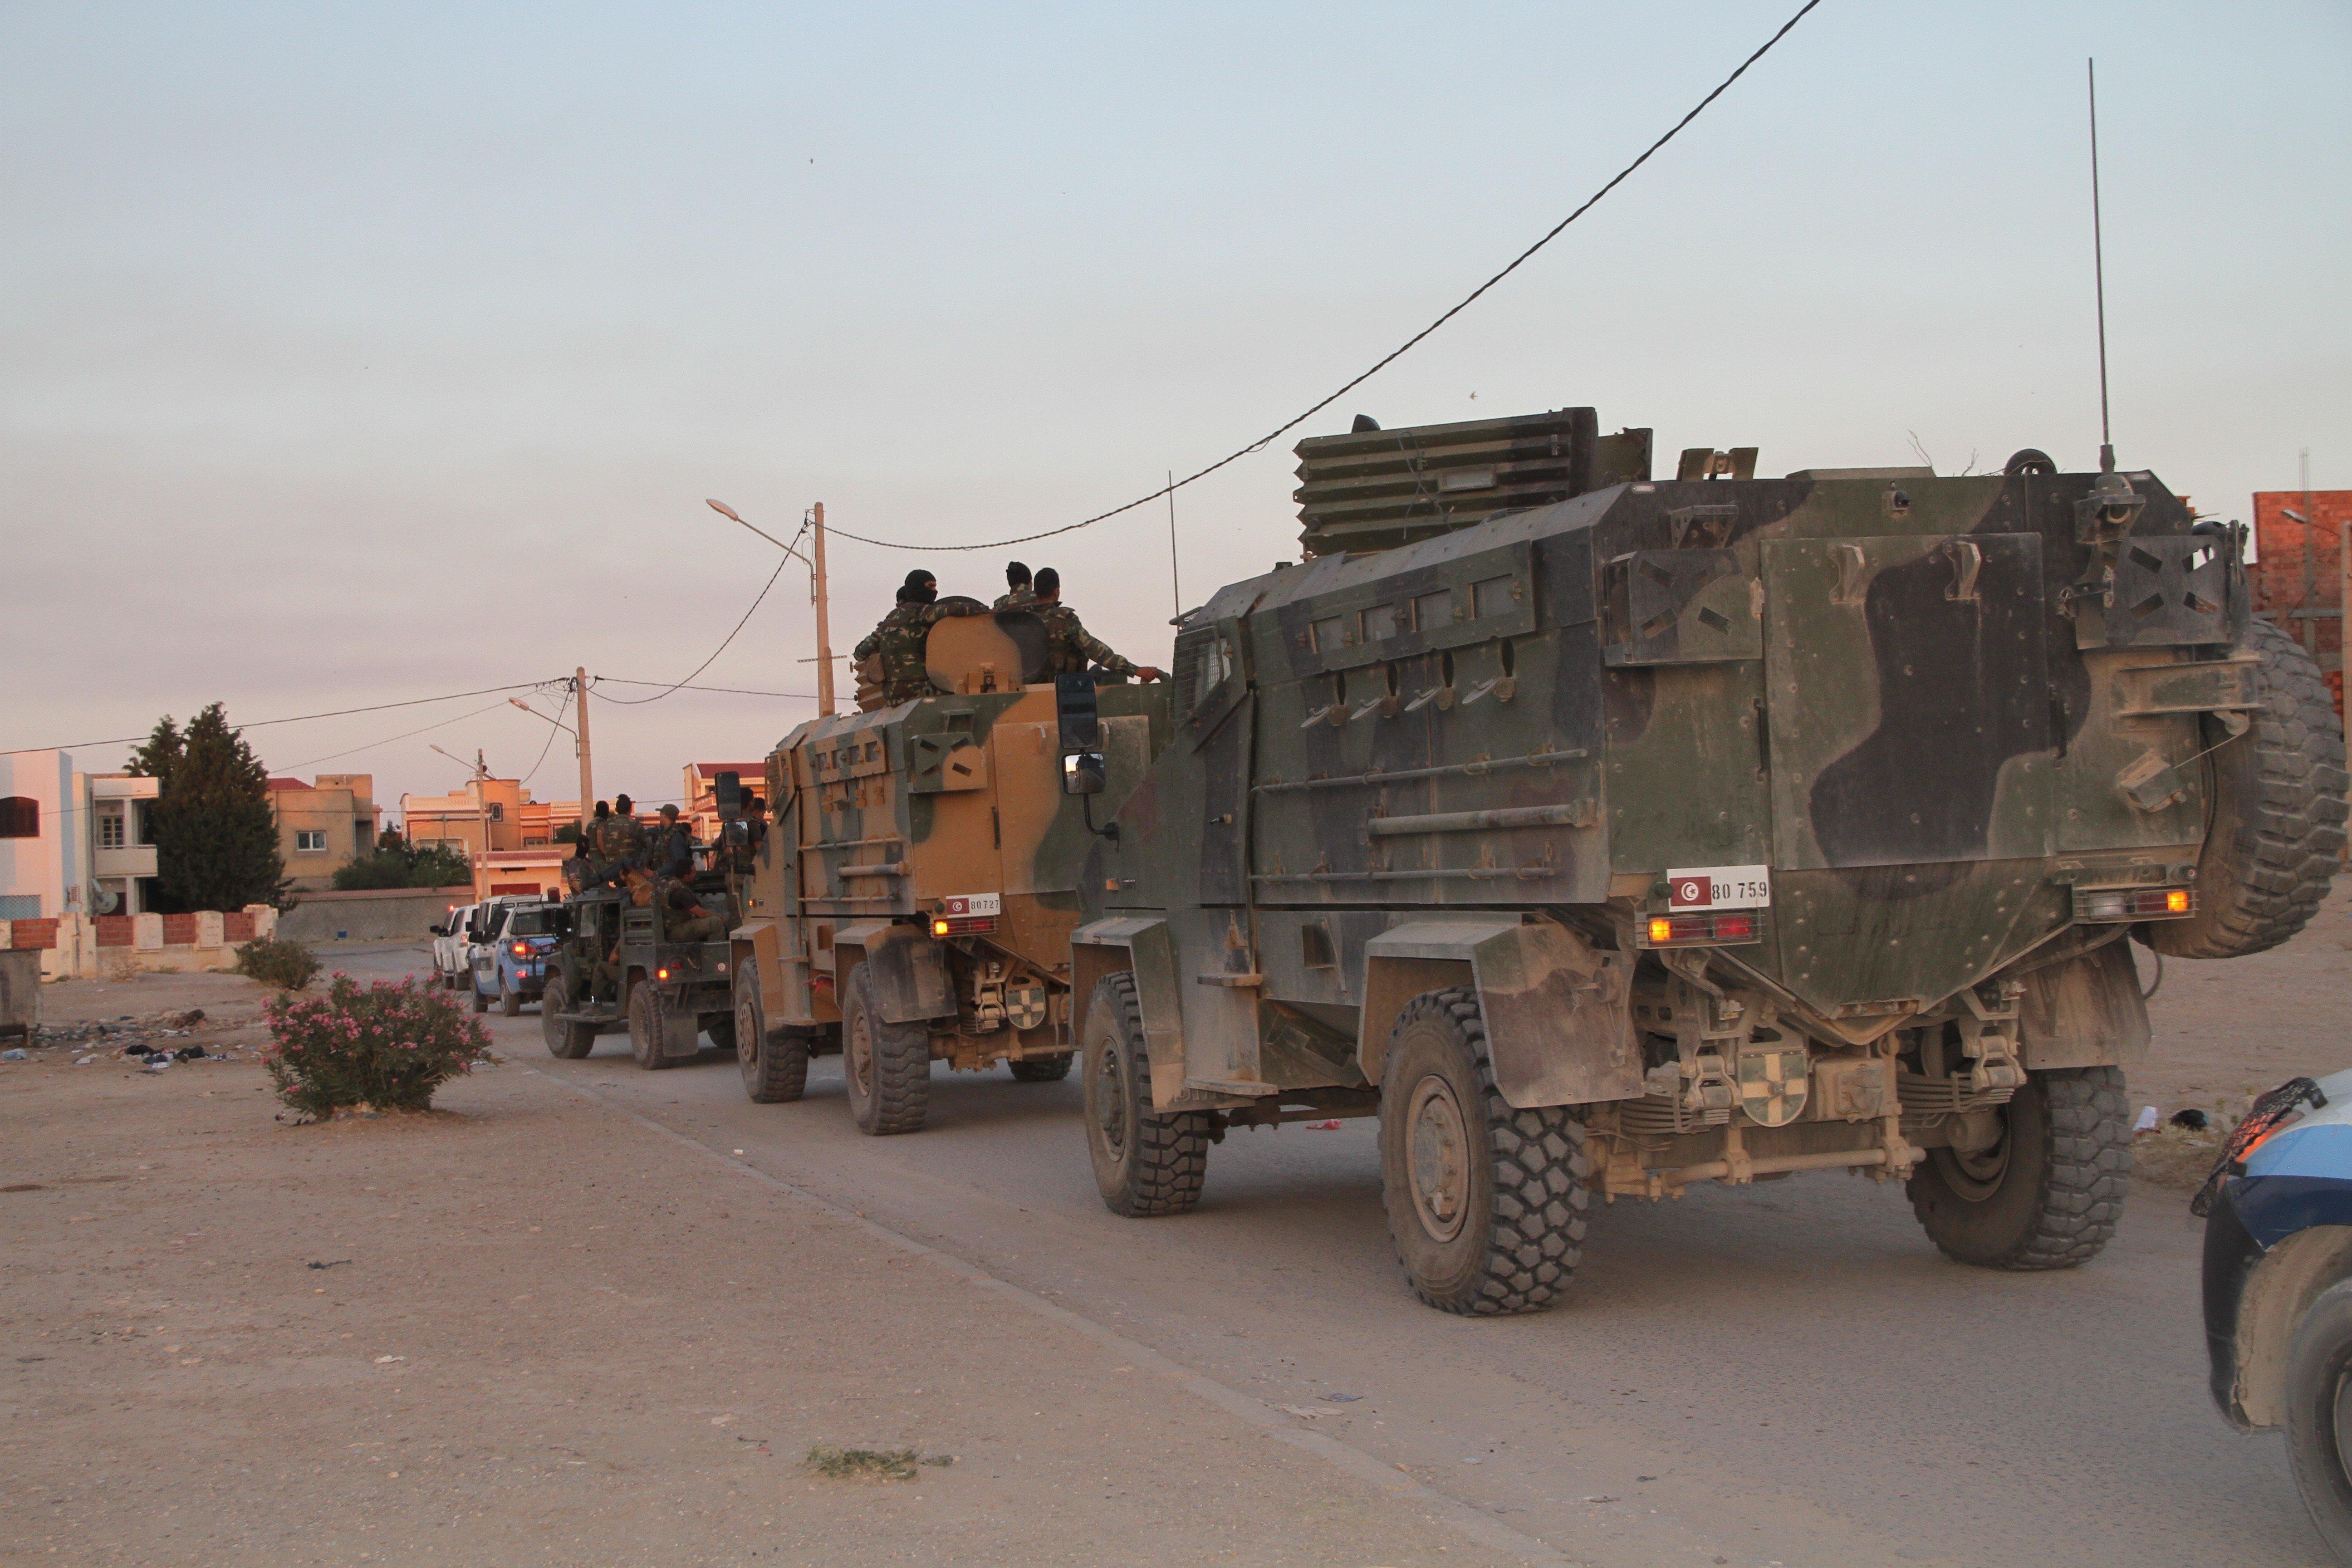 Une attaque terroriste dans la ville de Sebiba fait un